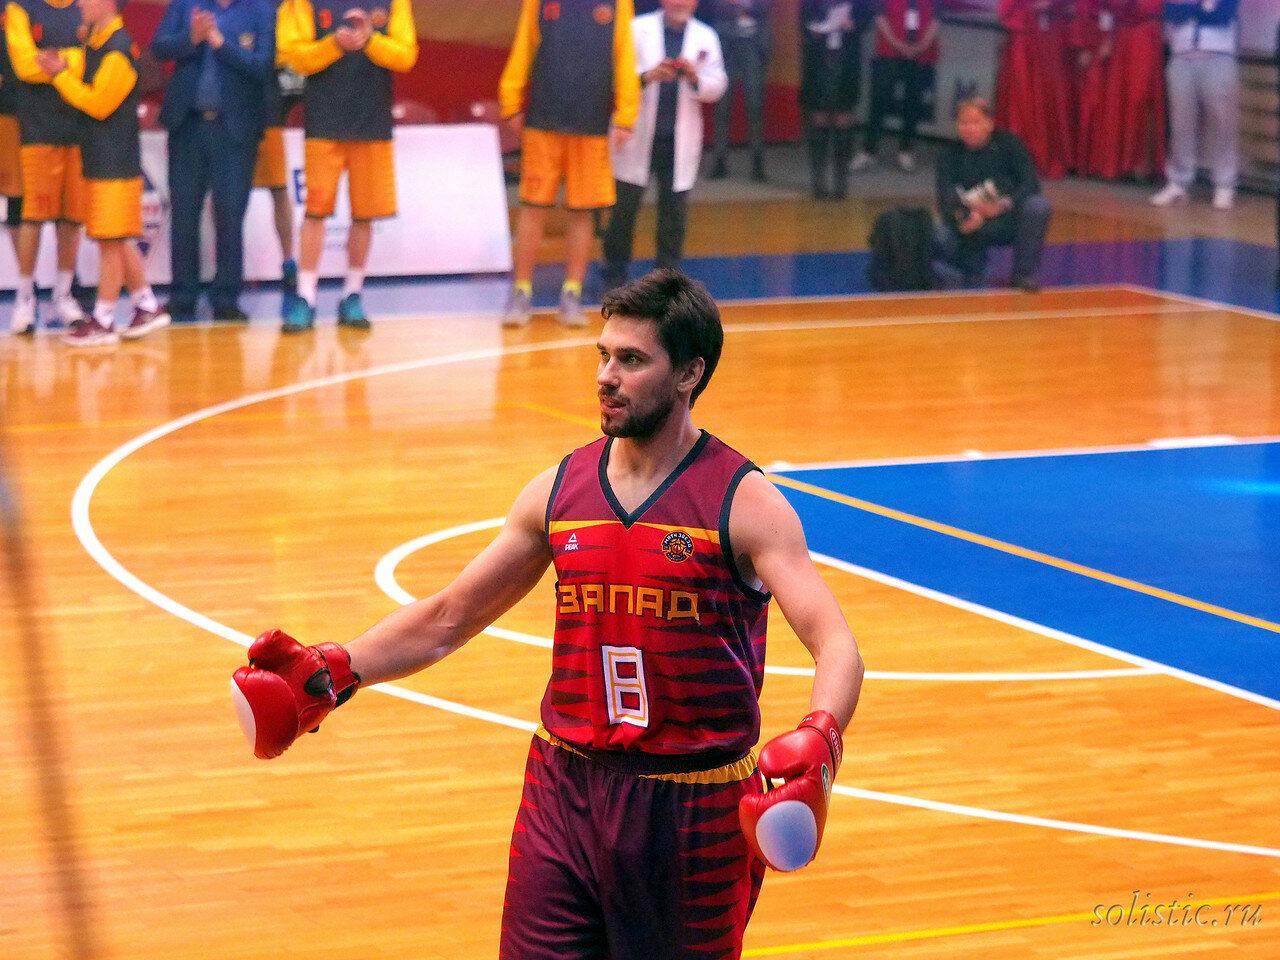 118 Матч звезд АСБ 2018 (ассоциации студенческого баскетбола)